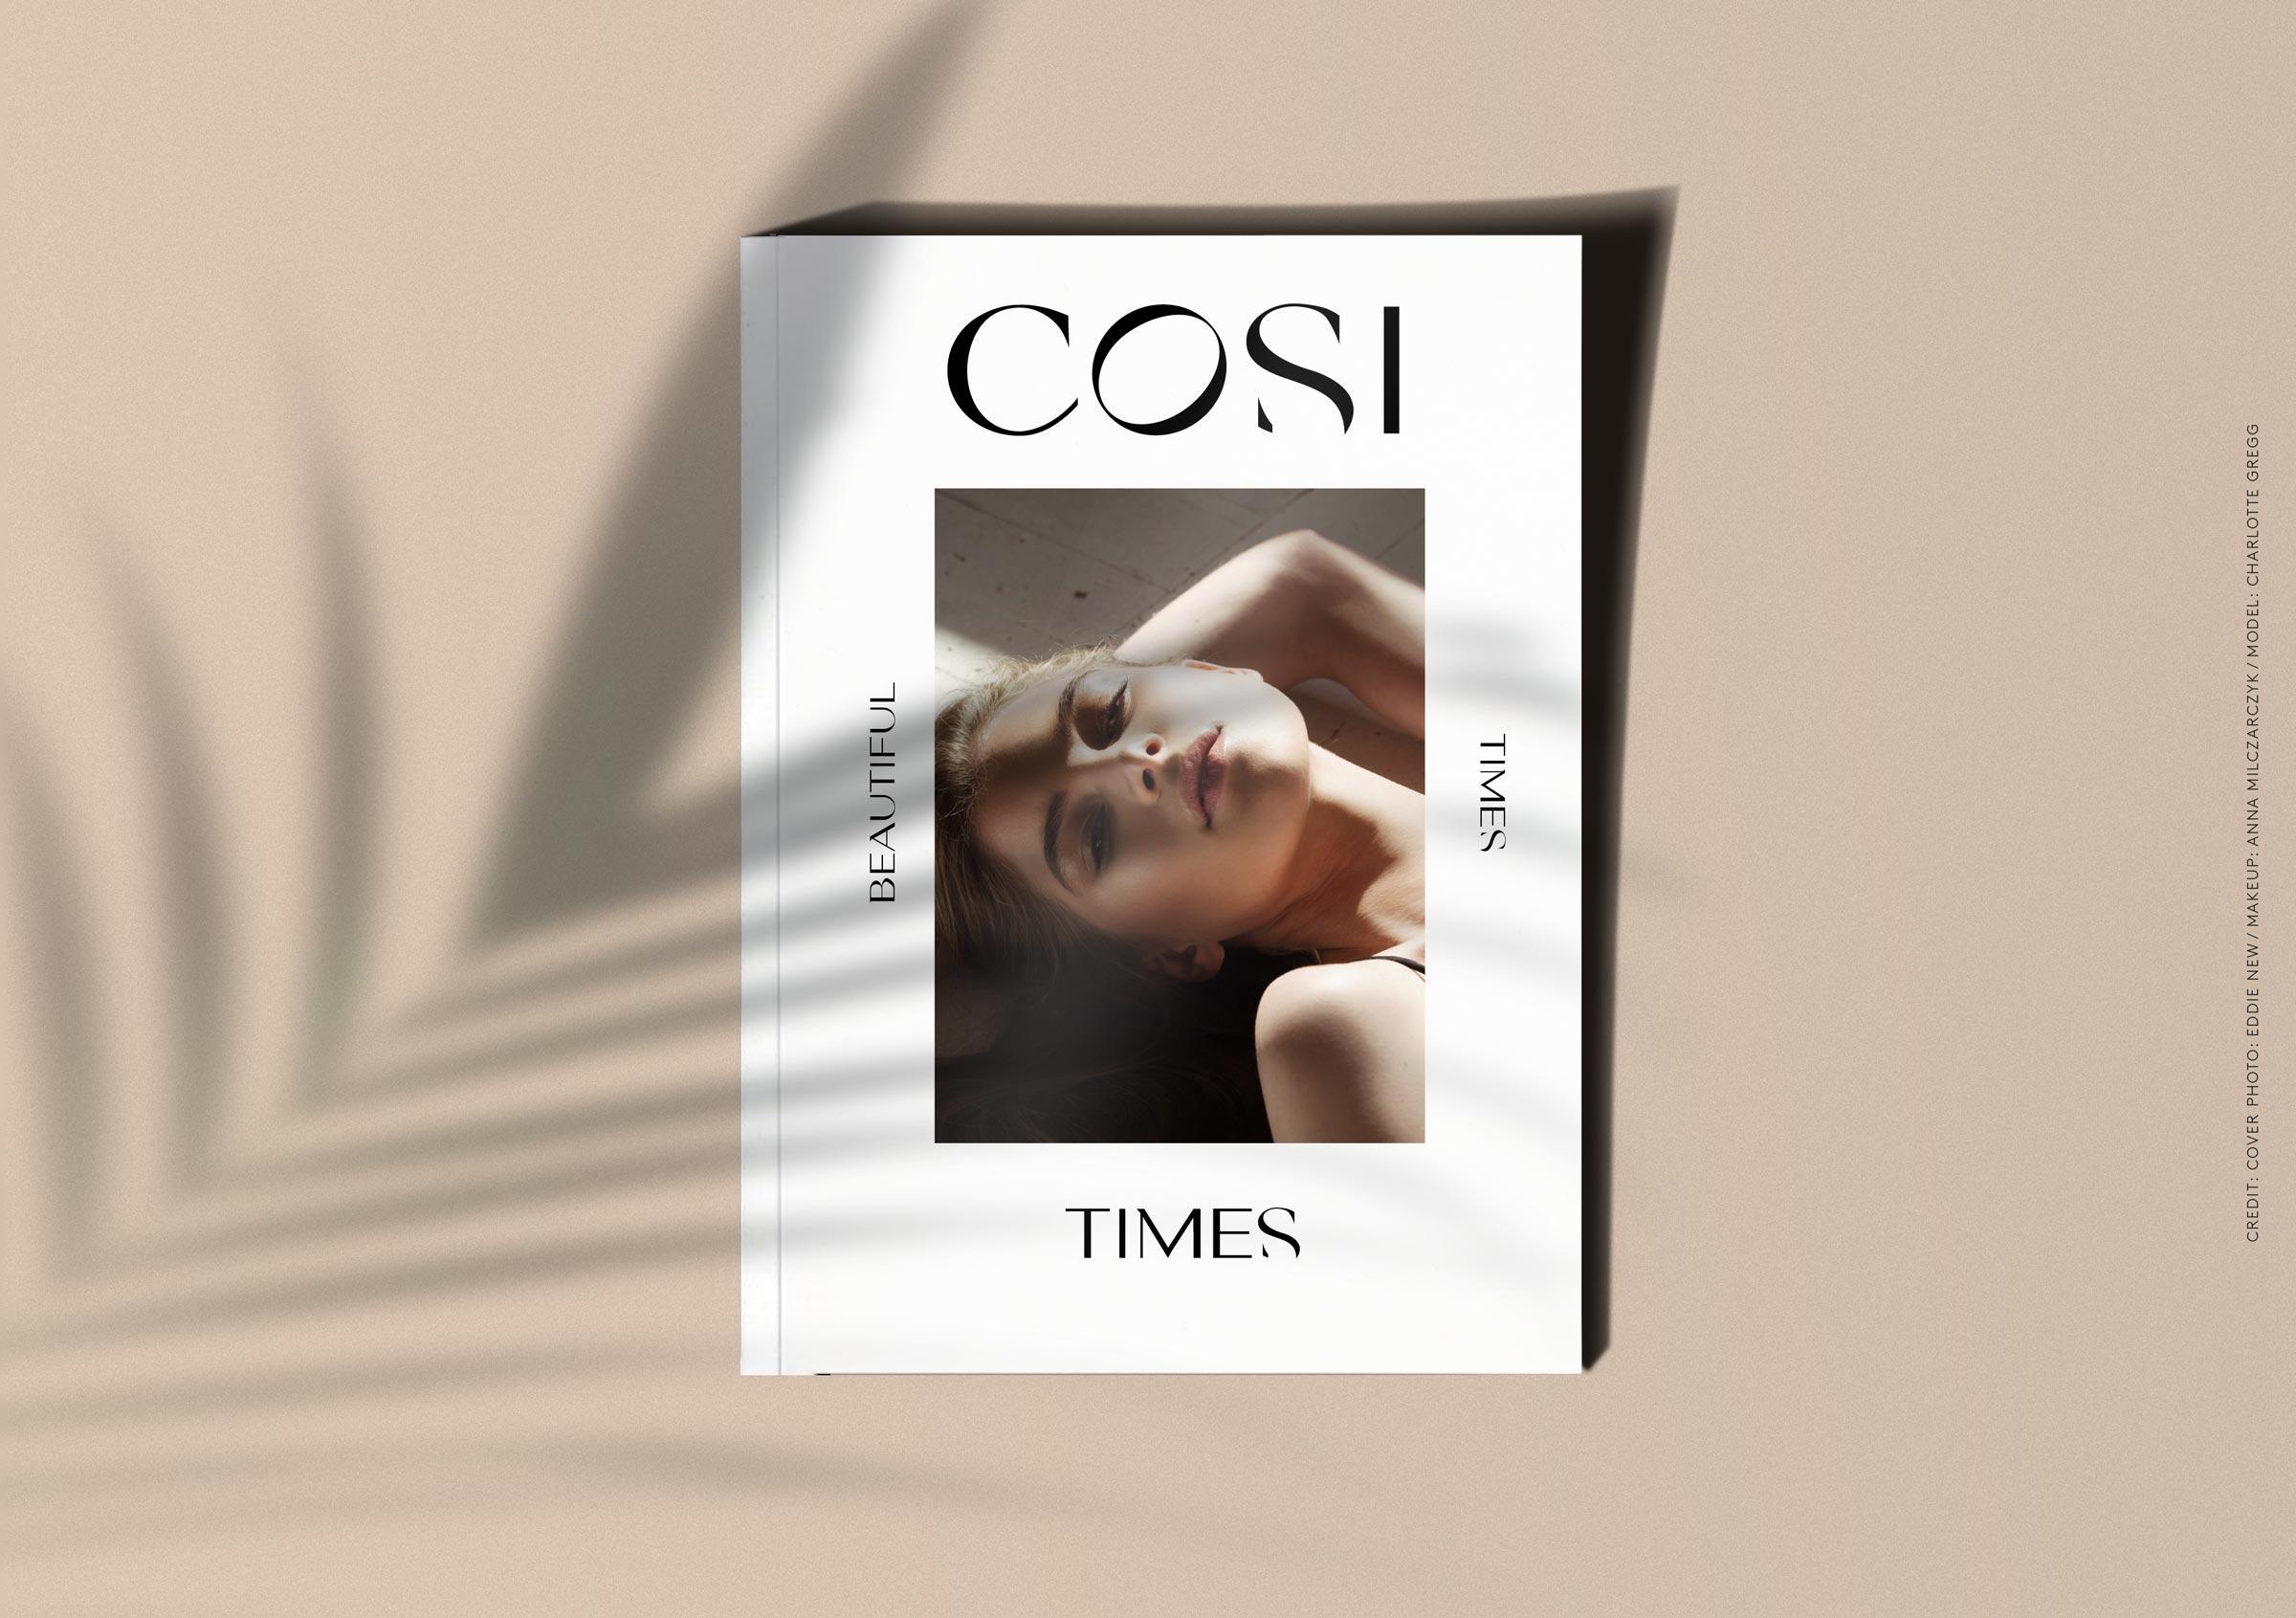 Cosi-Times-Typeface-Font-Nikolas-Wrobel-_Magzine_Cover